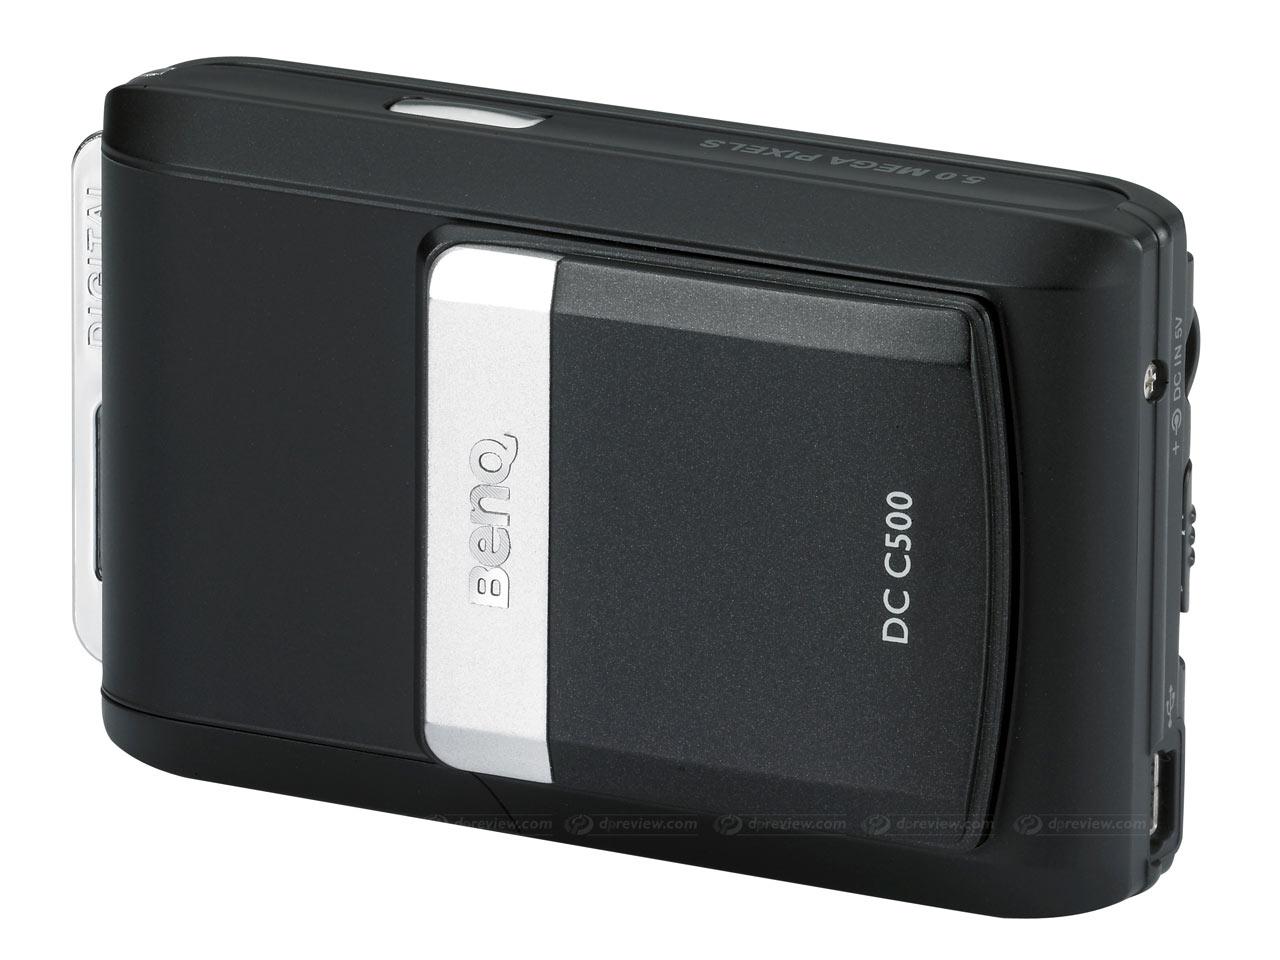 BENQ CAMERA DC C500 DRIVER FOR PC